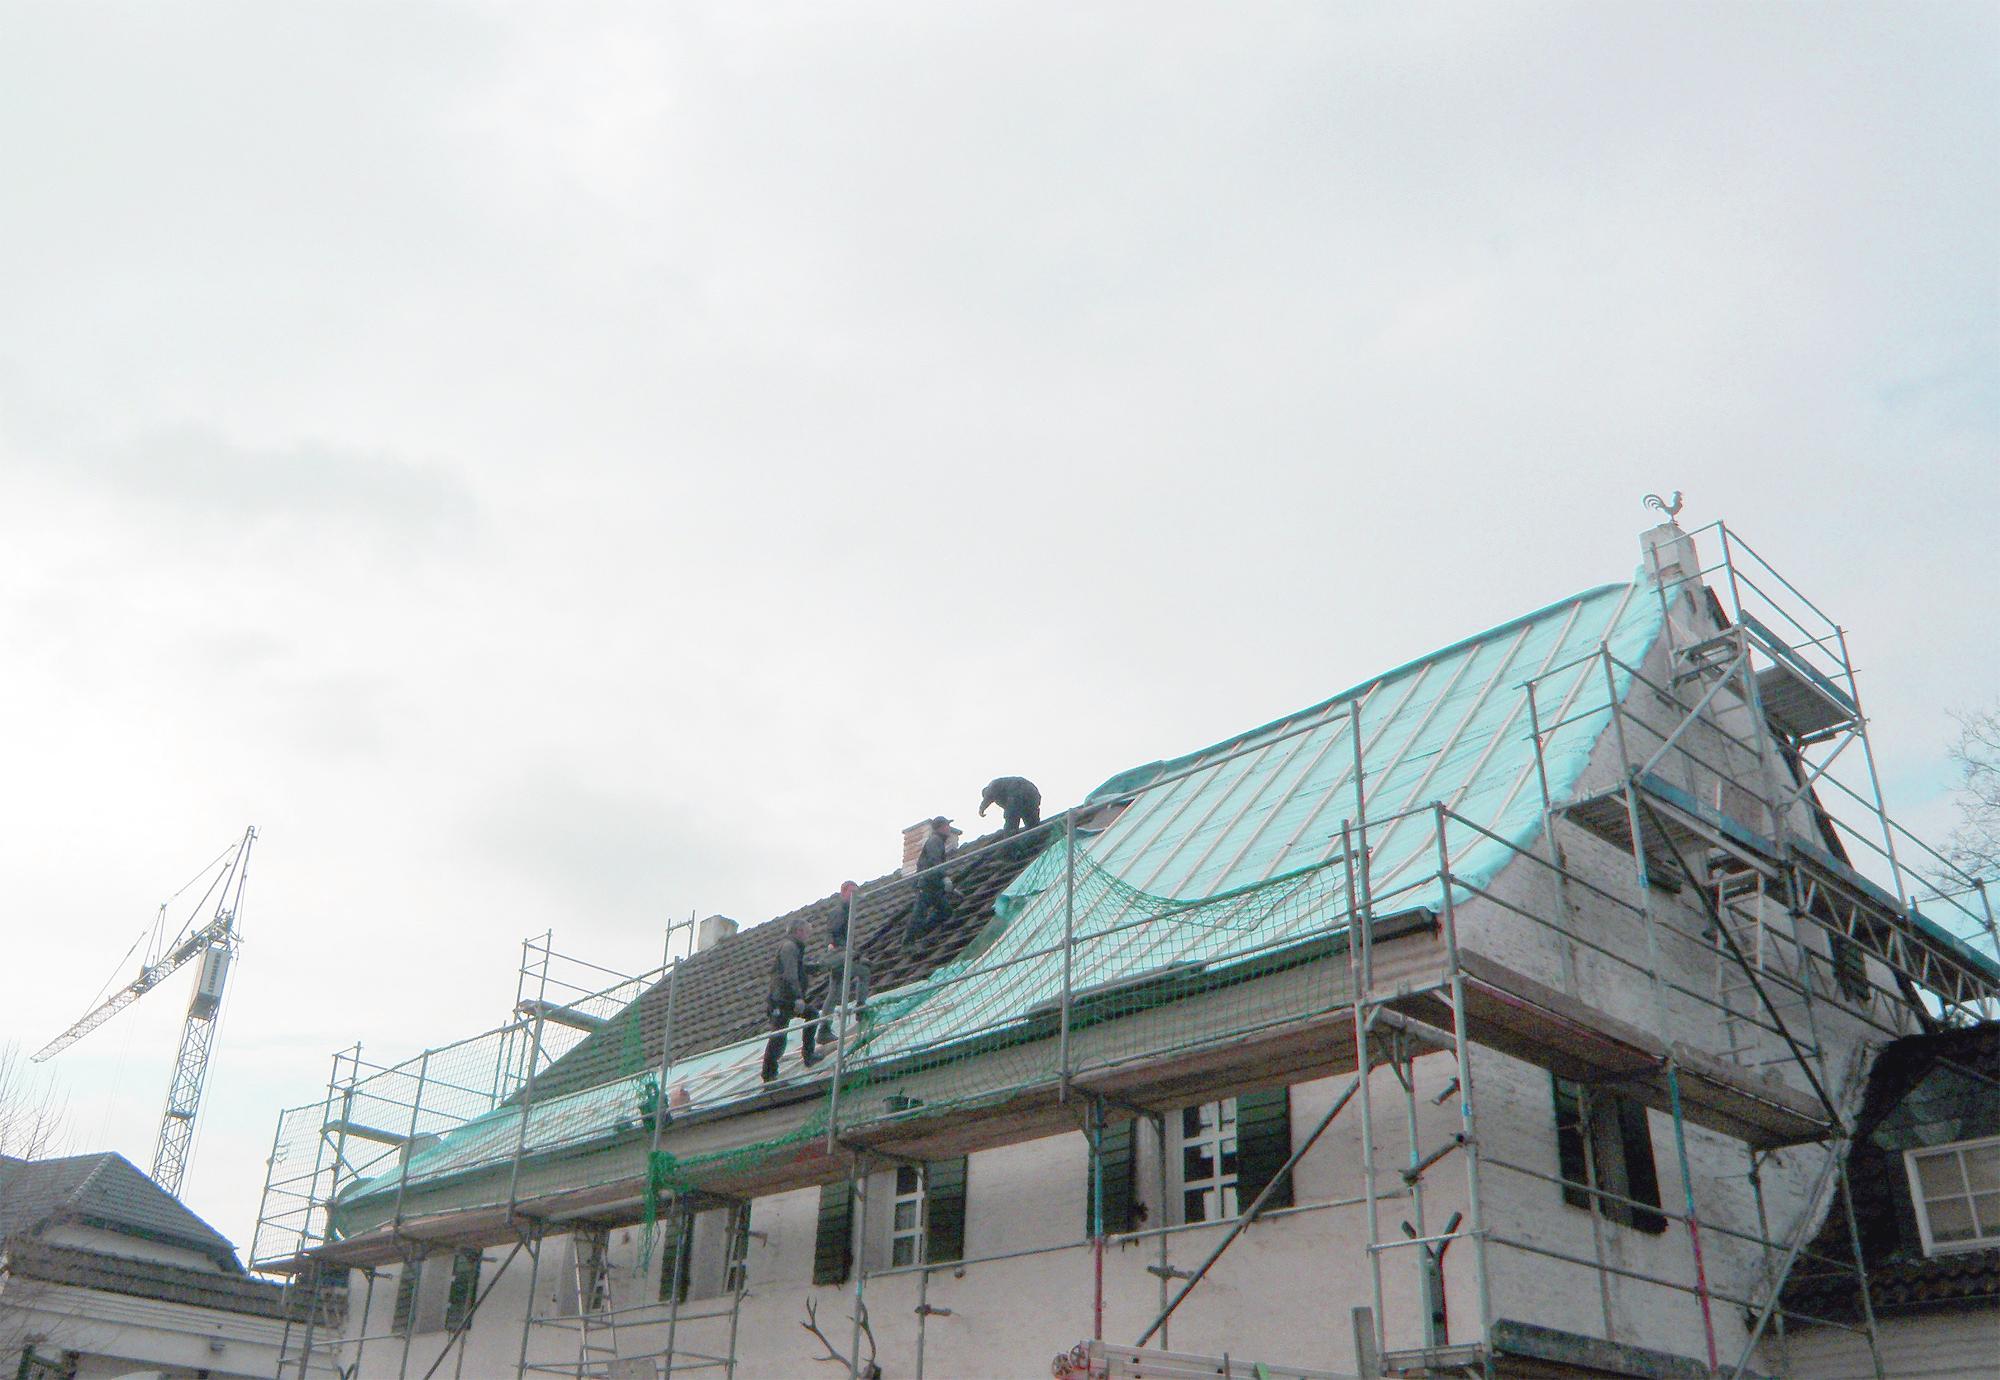 Dachdecker bei der Arbeit. Foto: www.texthandwerkerin.de